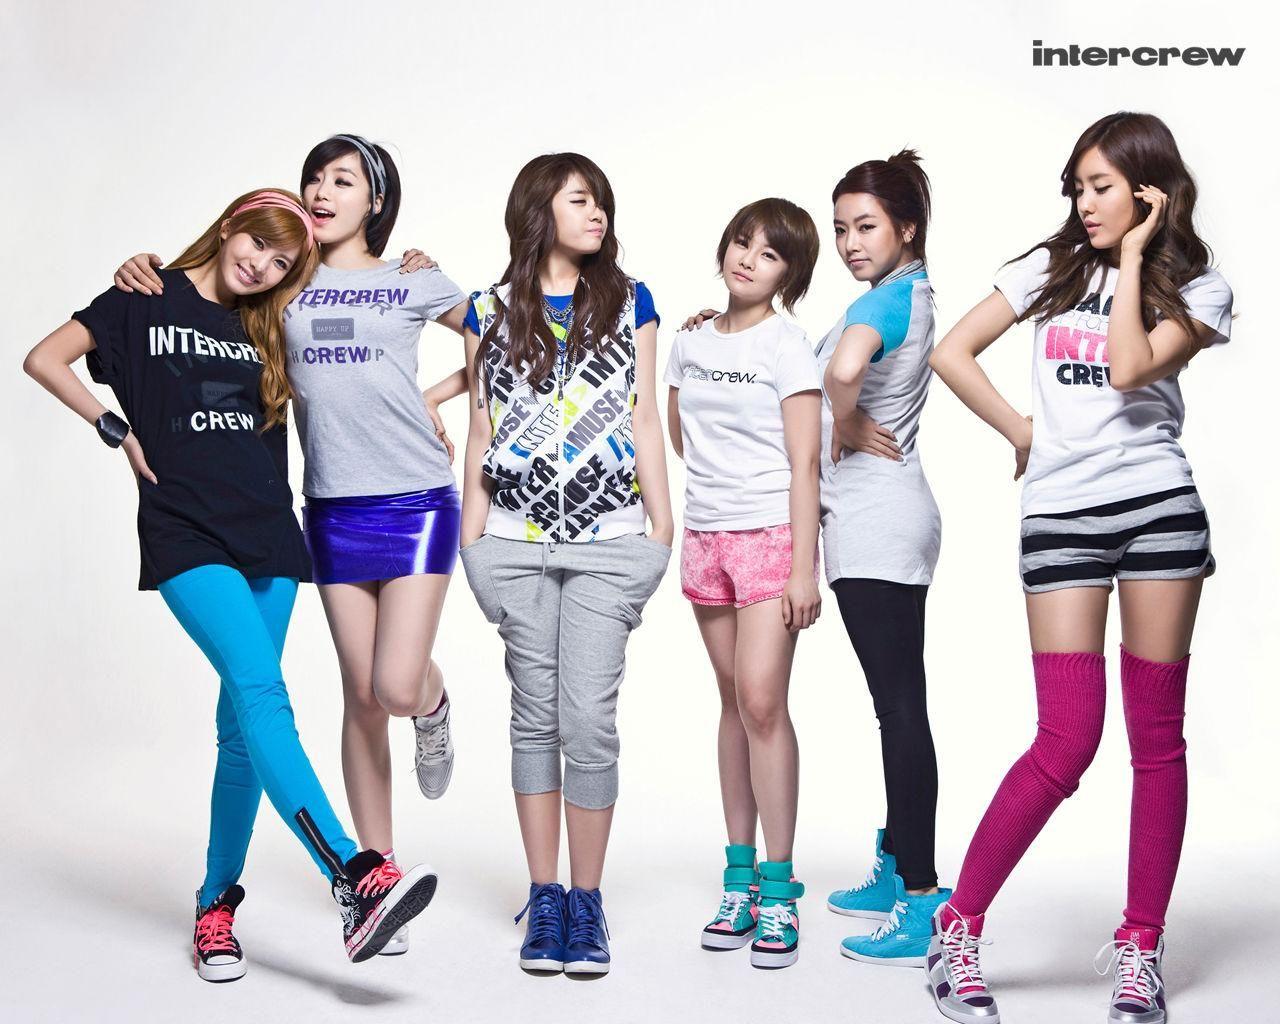 Hd wallpaper kpop - Best Korean Art Wallpaper T Ara For Intercrew Hd Wallpaper Download T